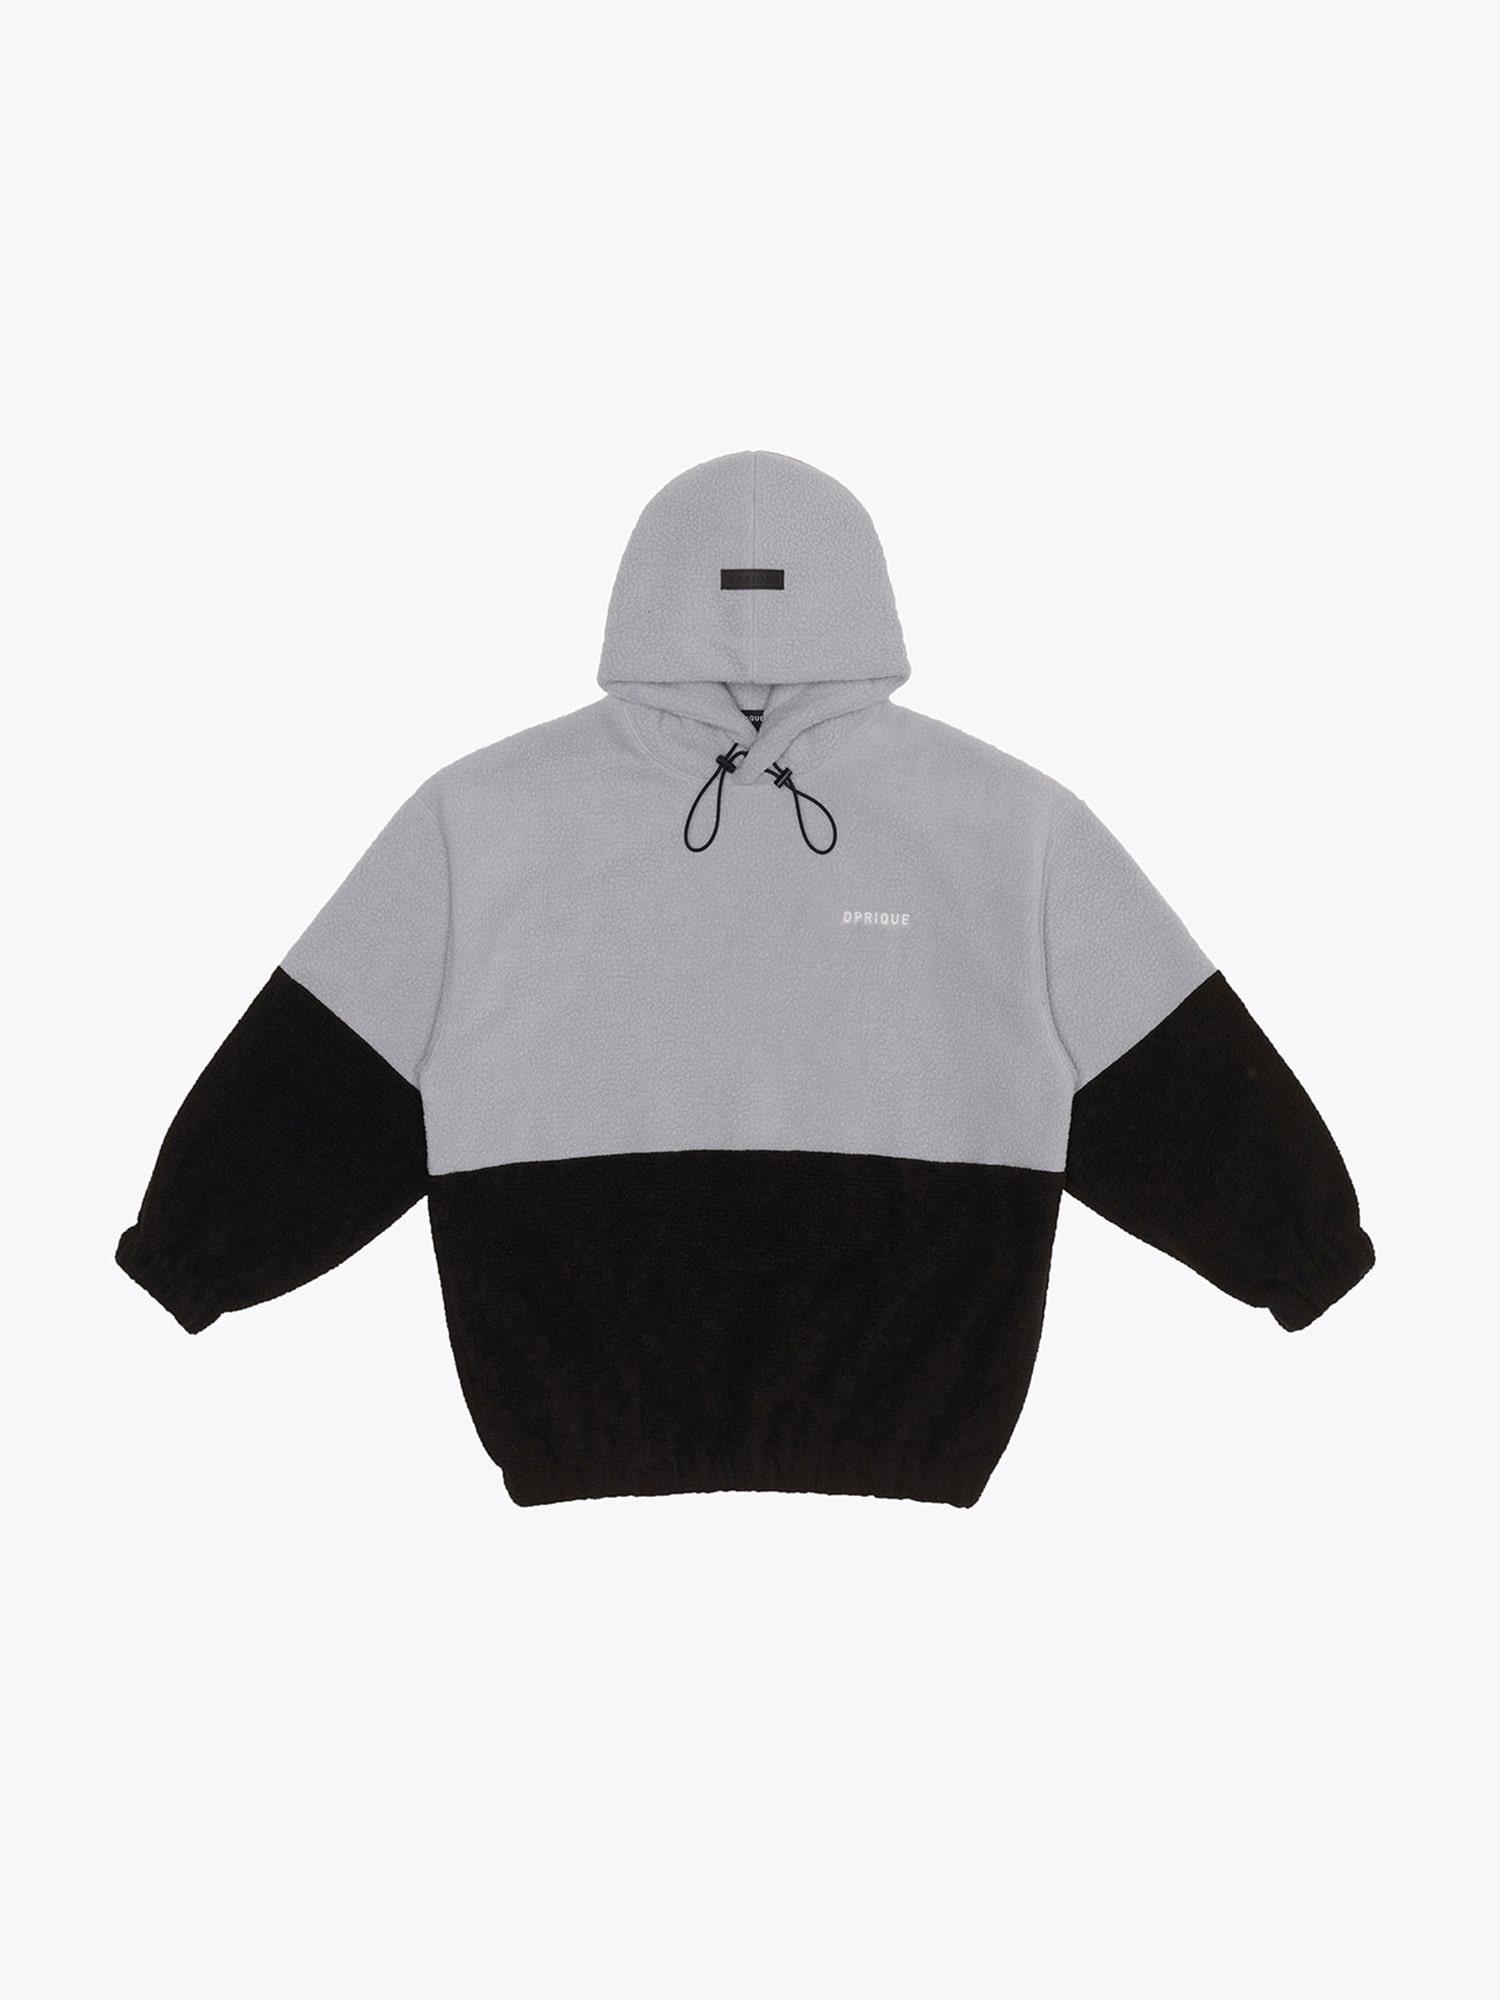 Oversized Fleece Hoodie - Grey/Black